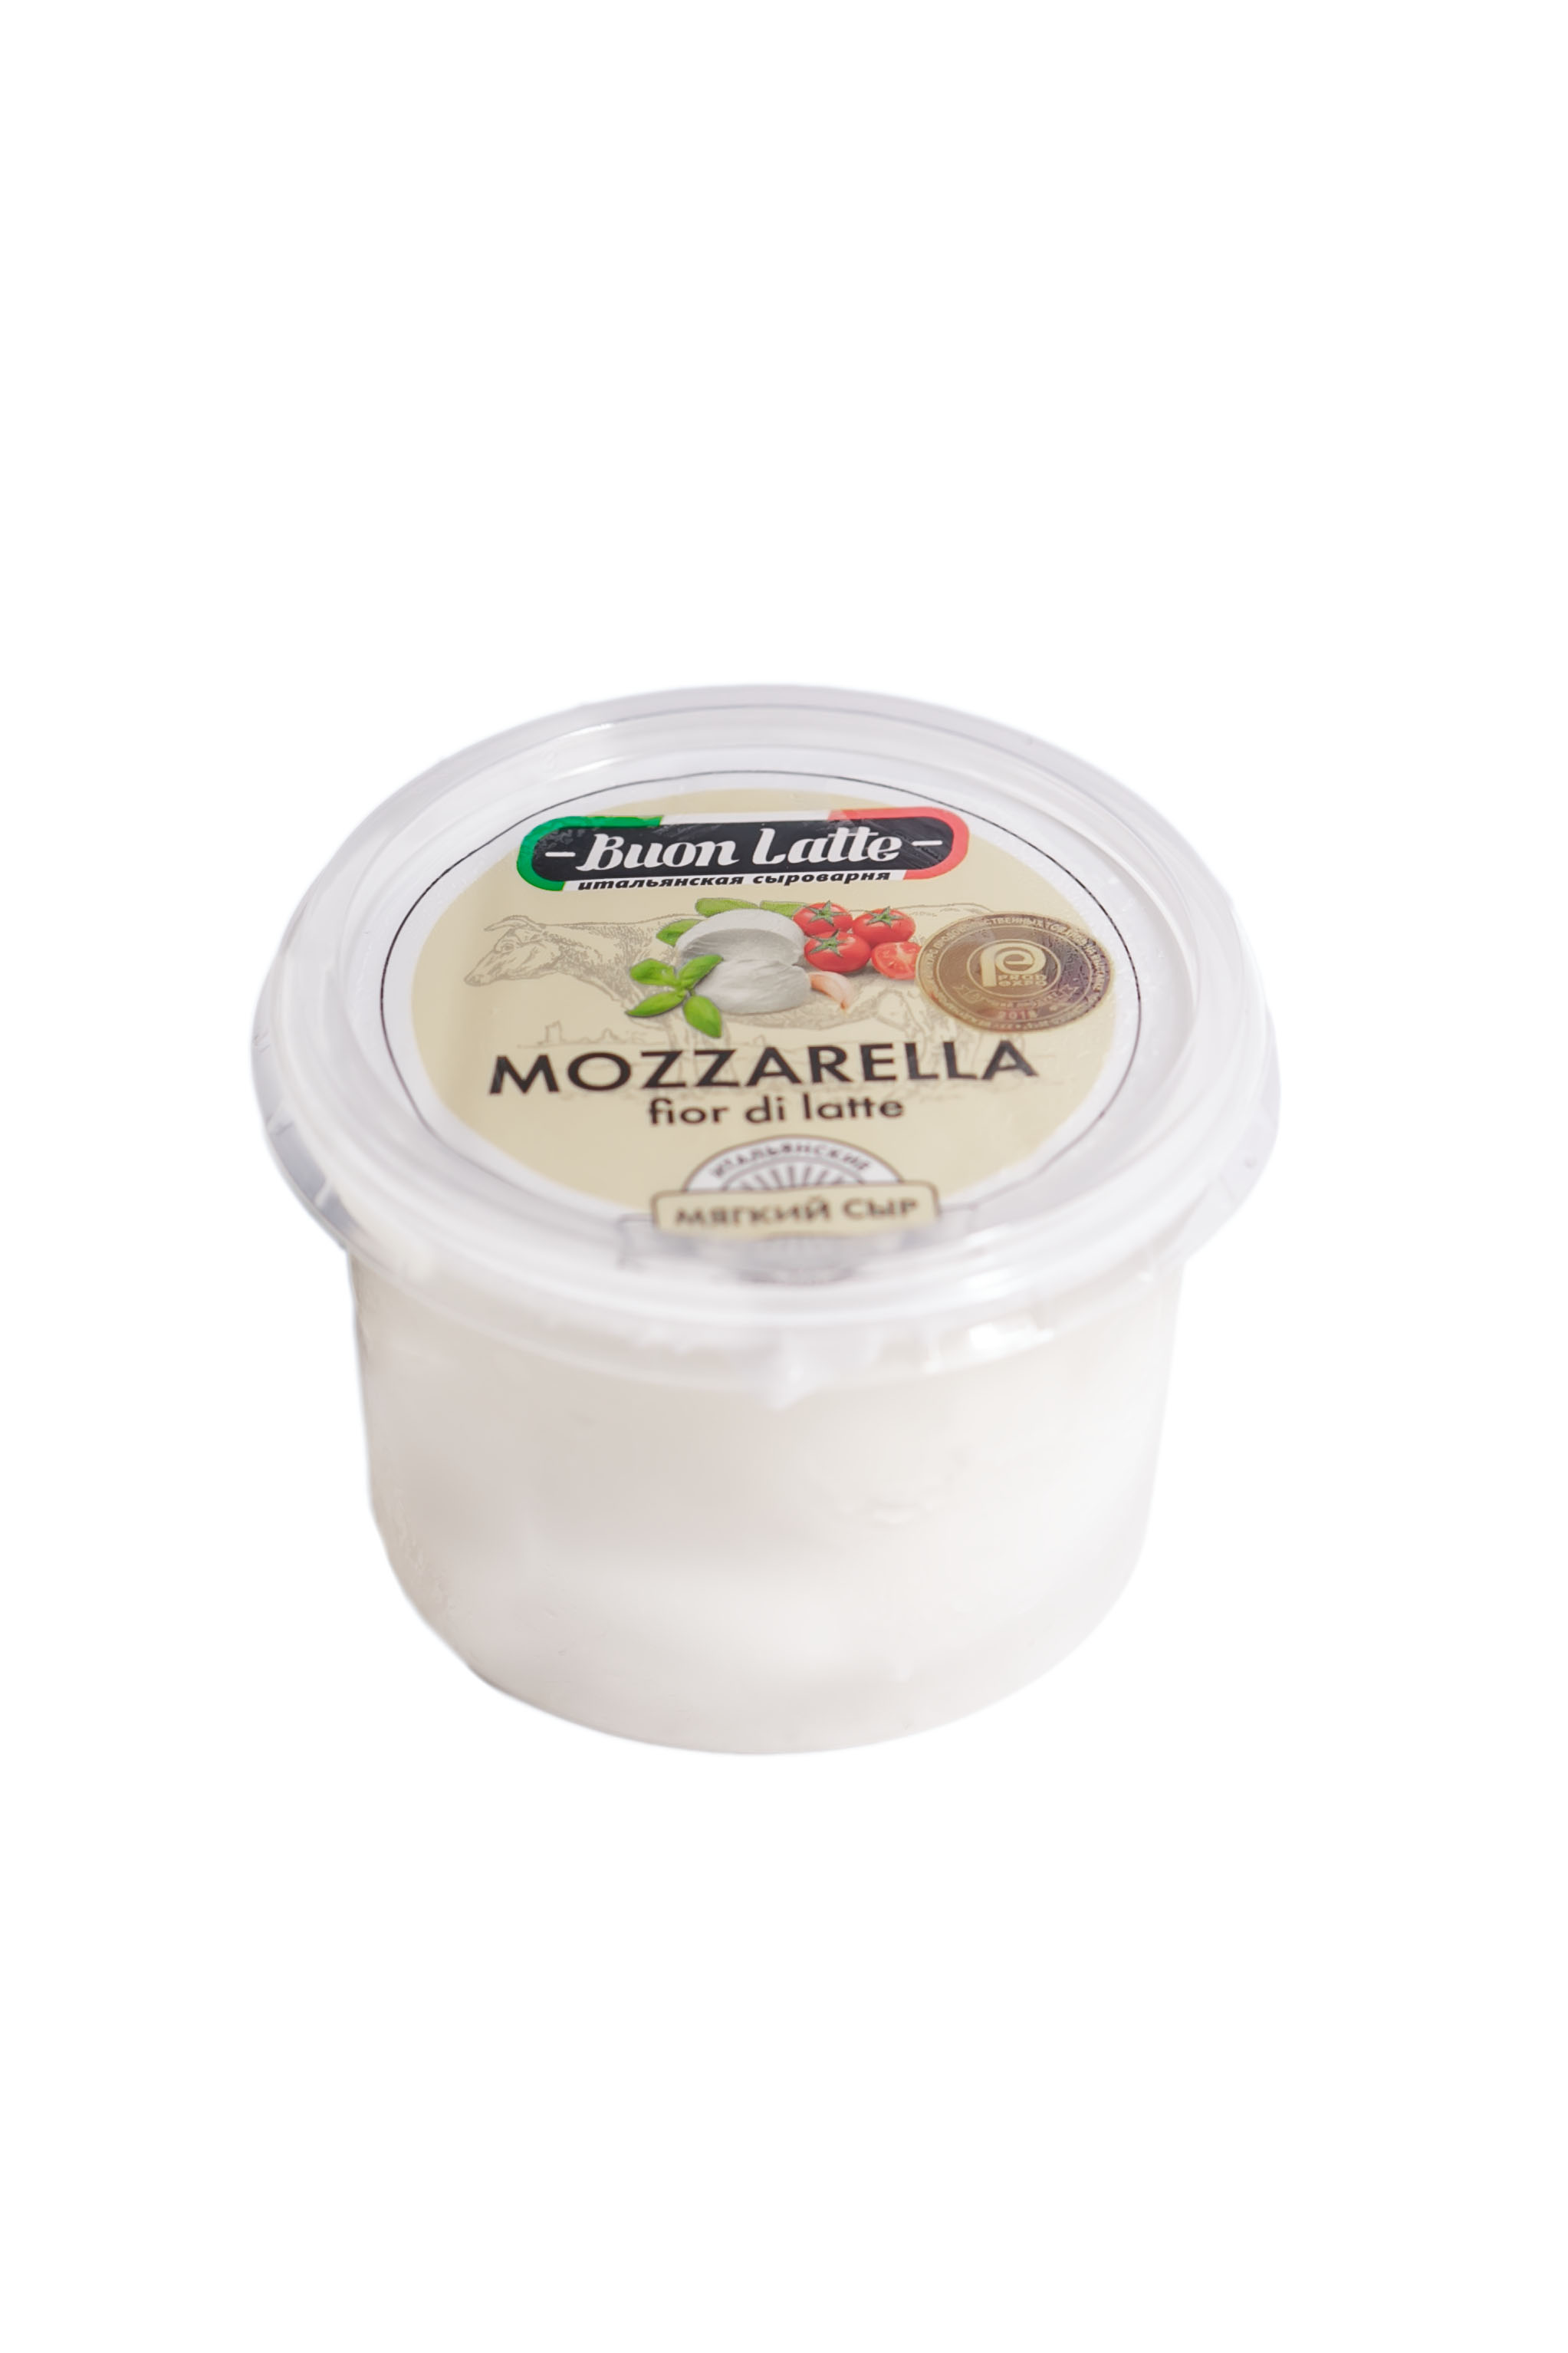 БЗМЖ Сыр моццарелла пластиковый 45-48% Бон Латте